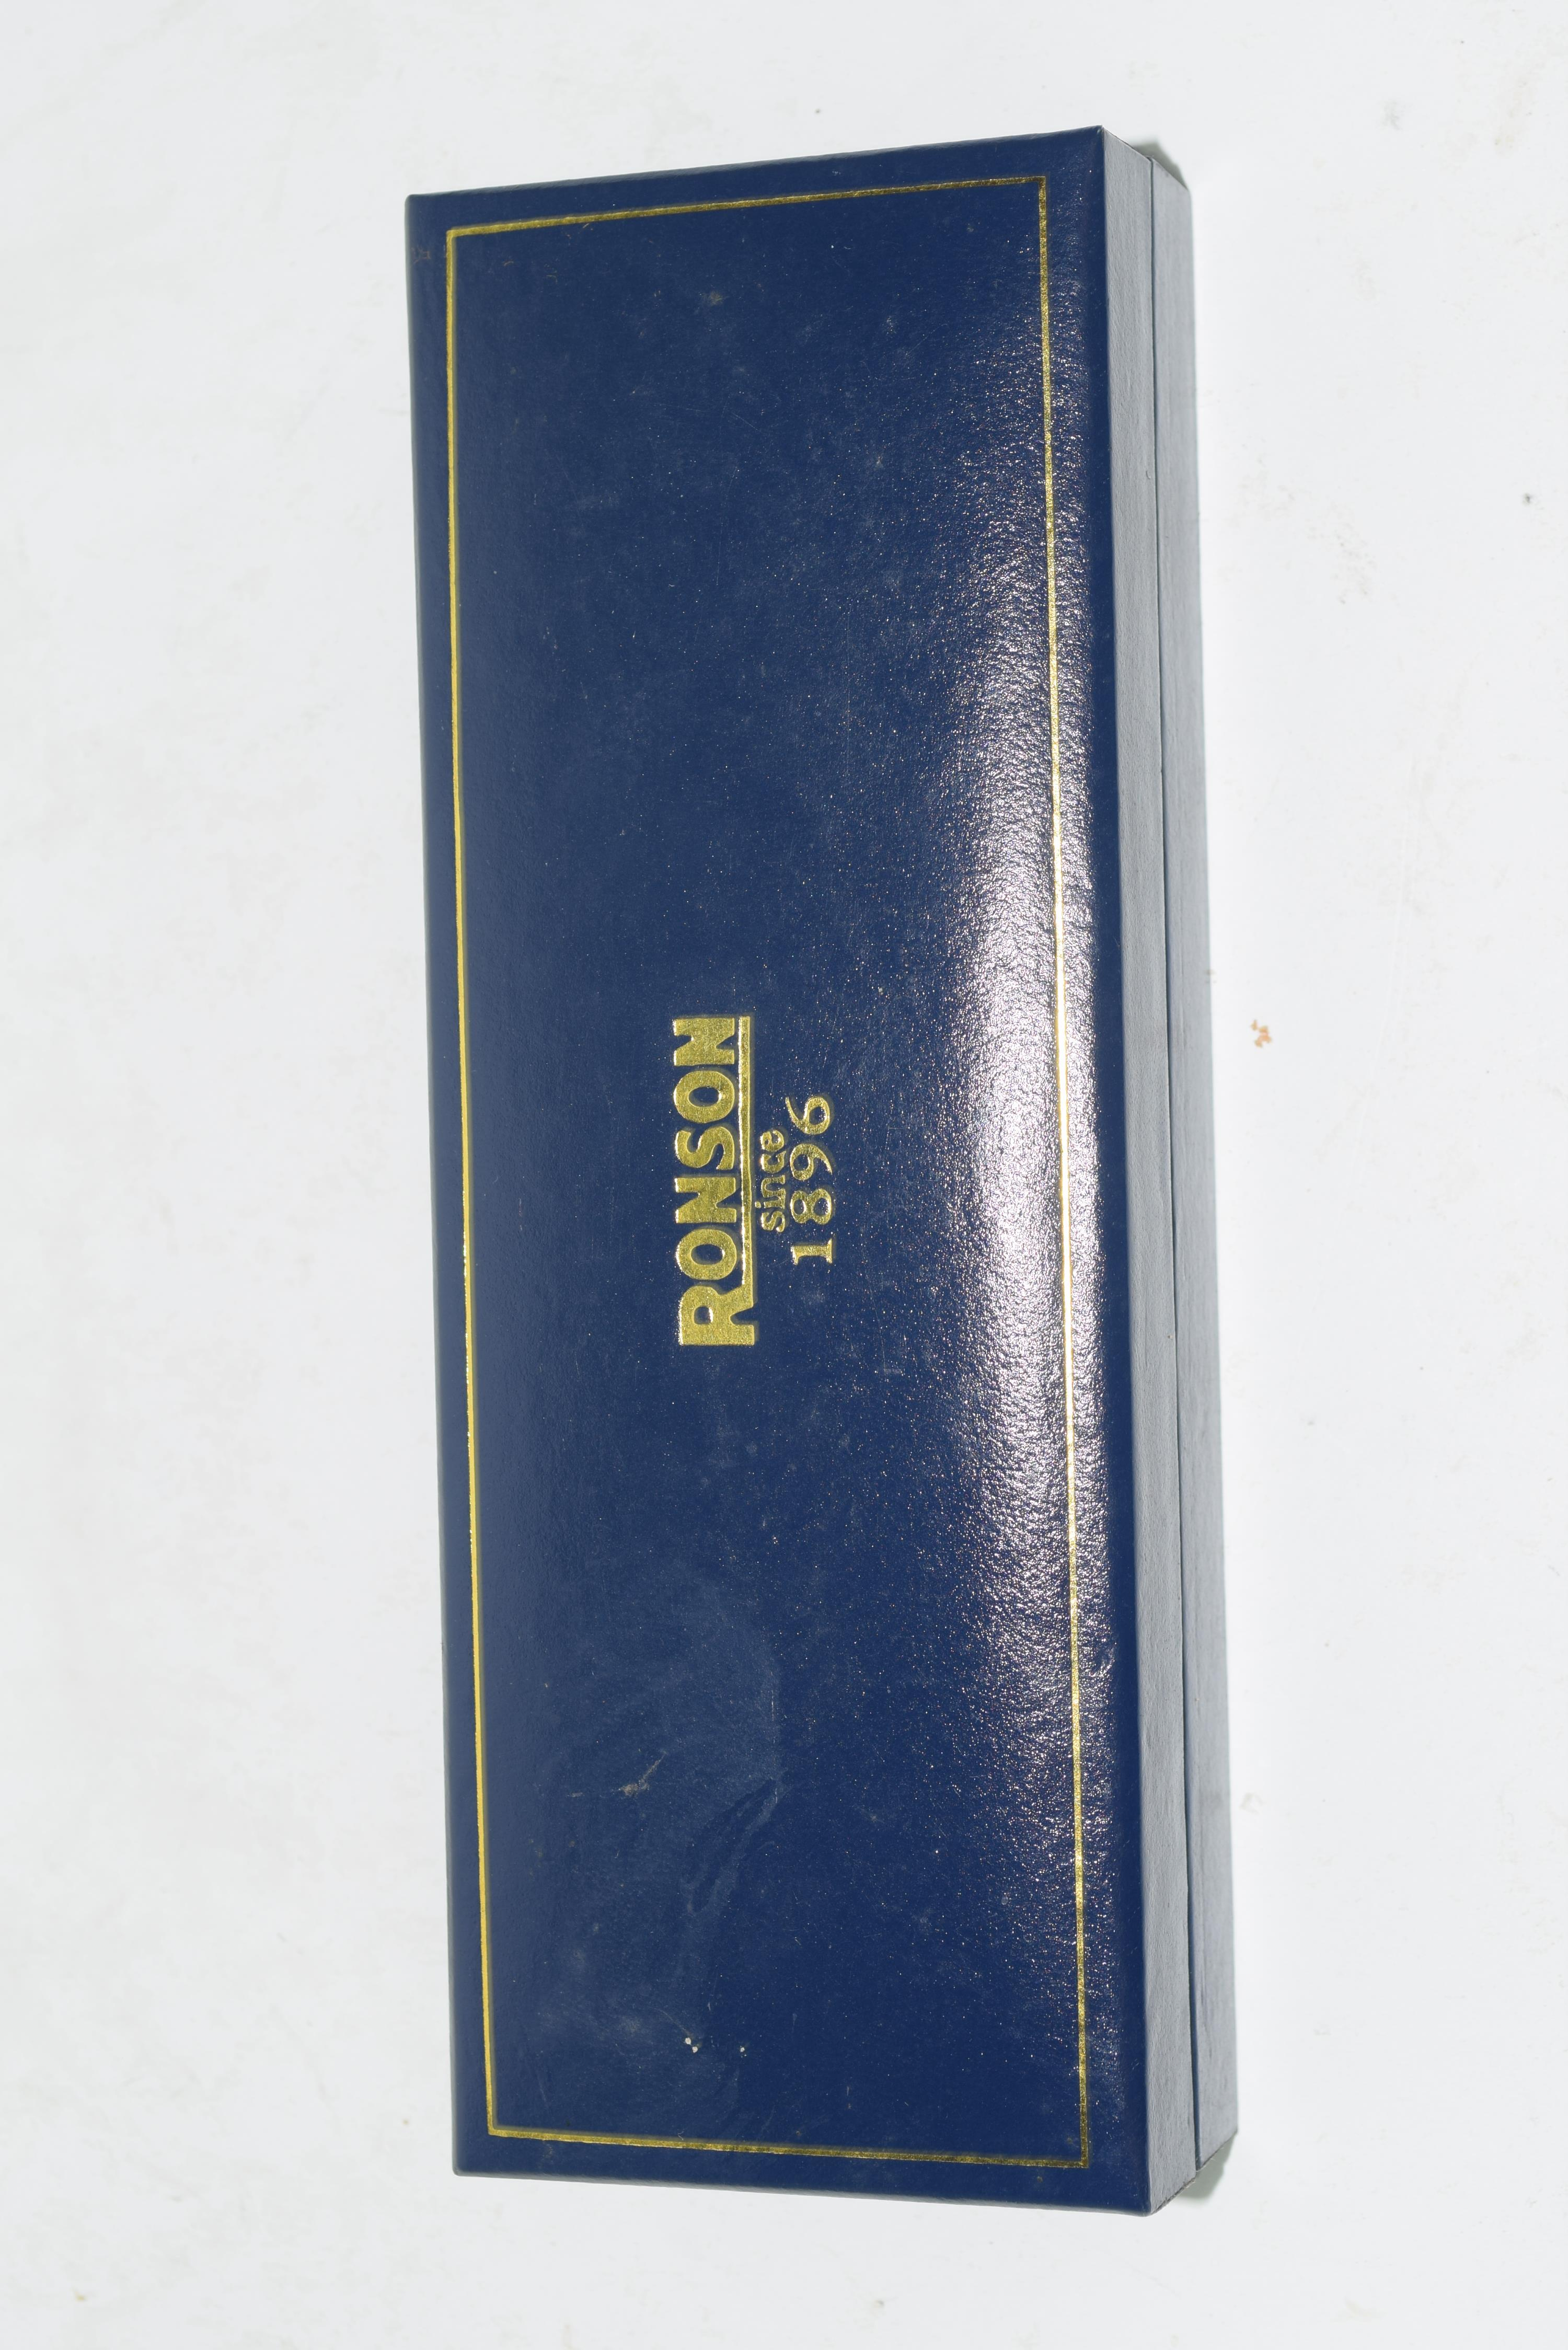 Ronson fountain pen and pencil